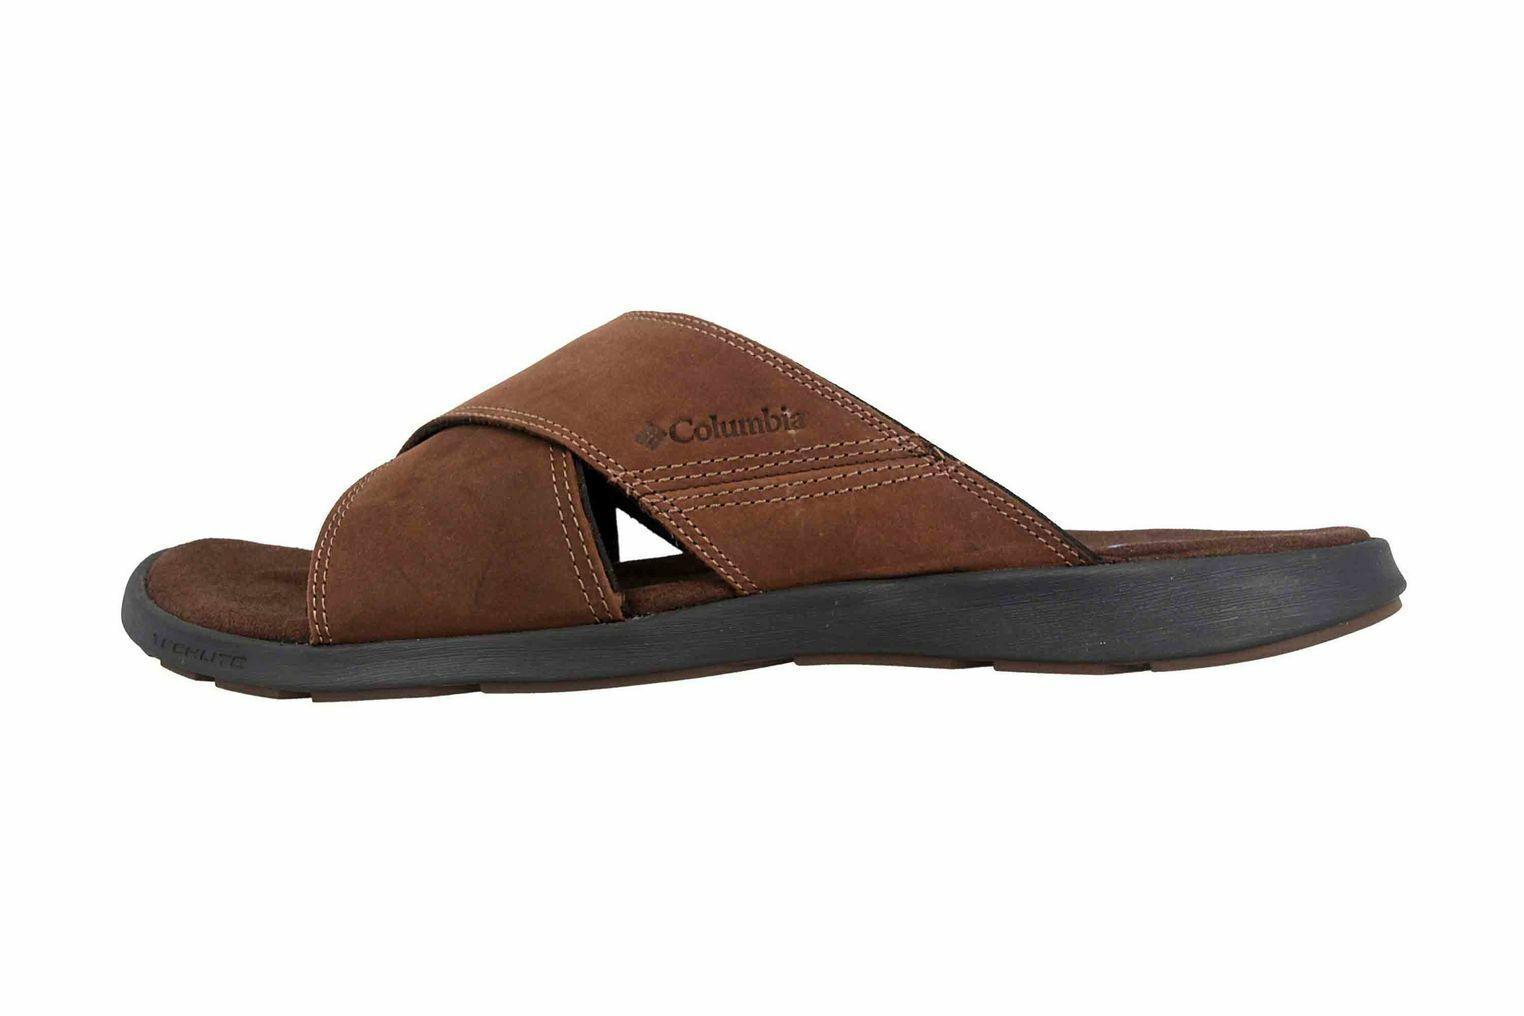 Columbia taranto sandaler sandaler sandaler i bspringaaa särskild storlek BM 1003 -200  modern